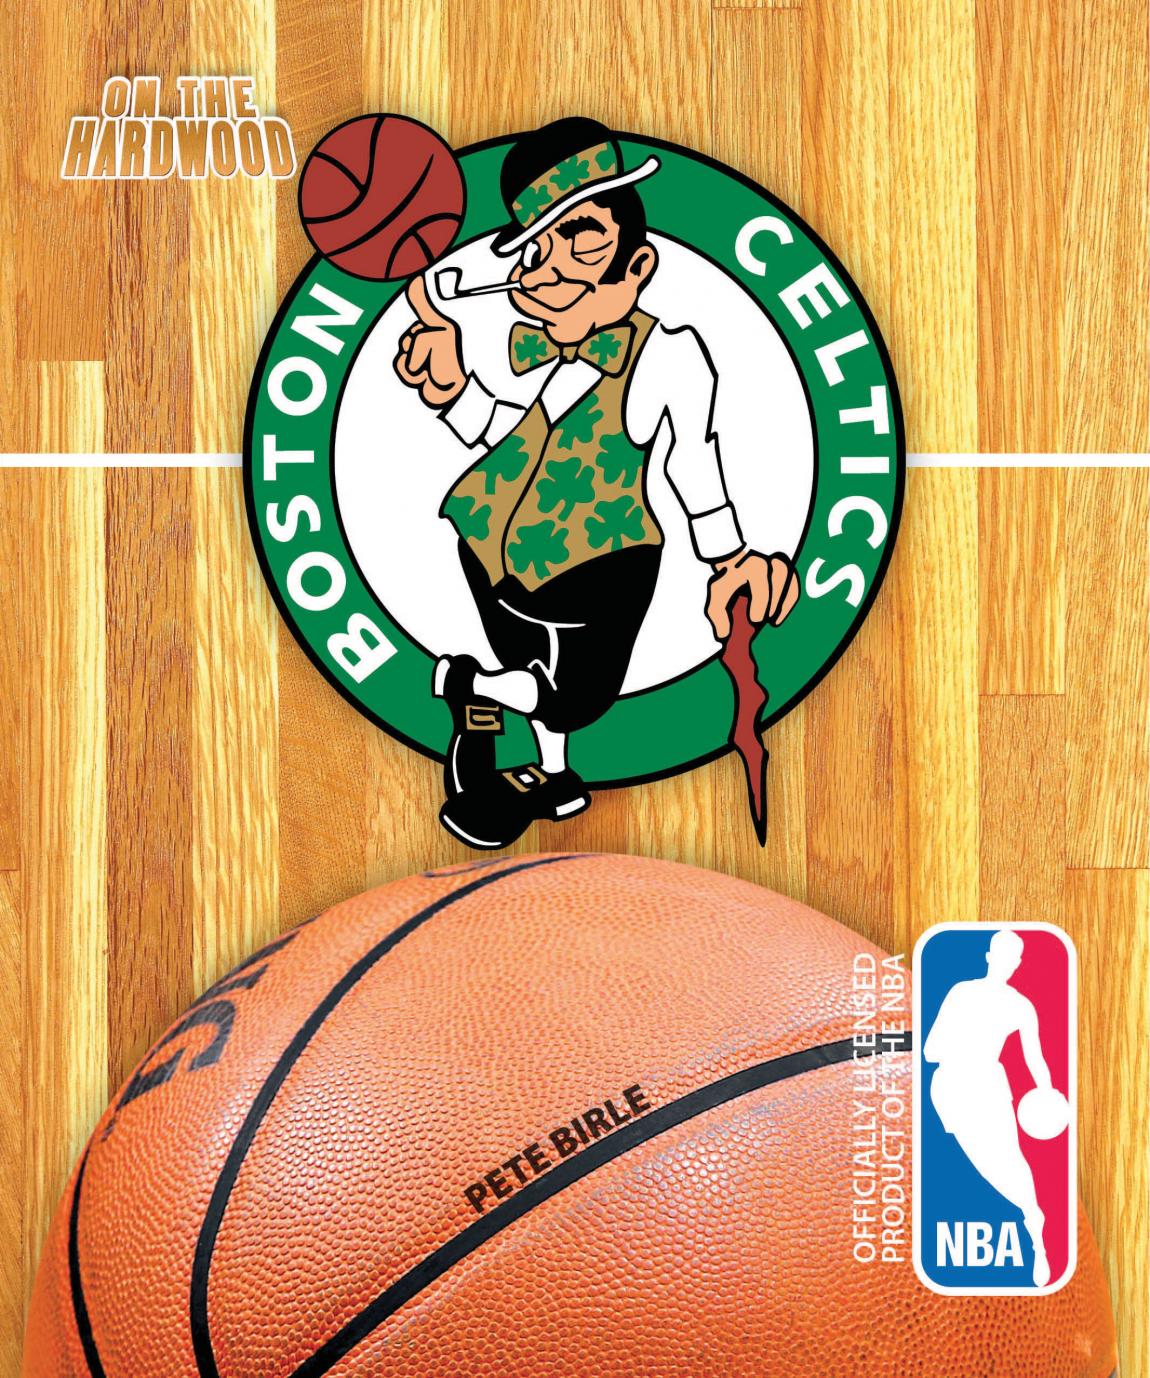 Celtics-e1502389750815-1.png